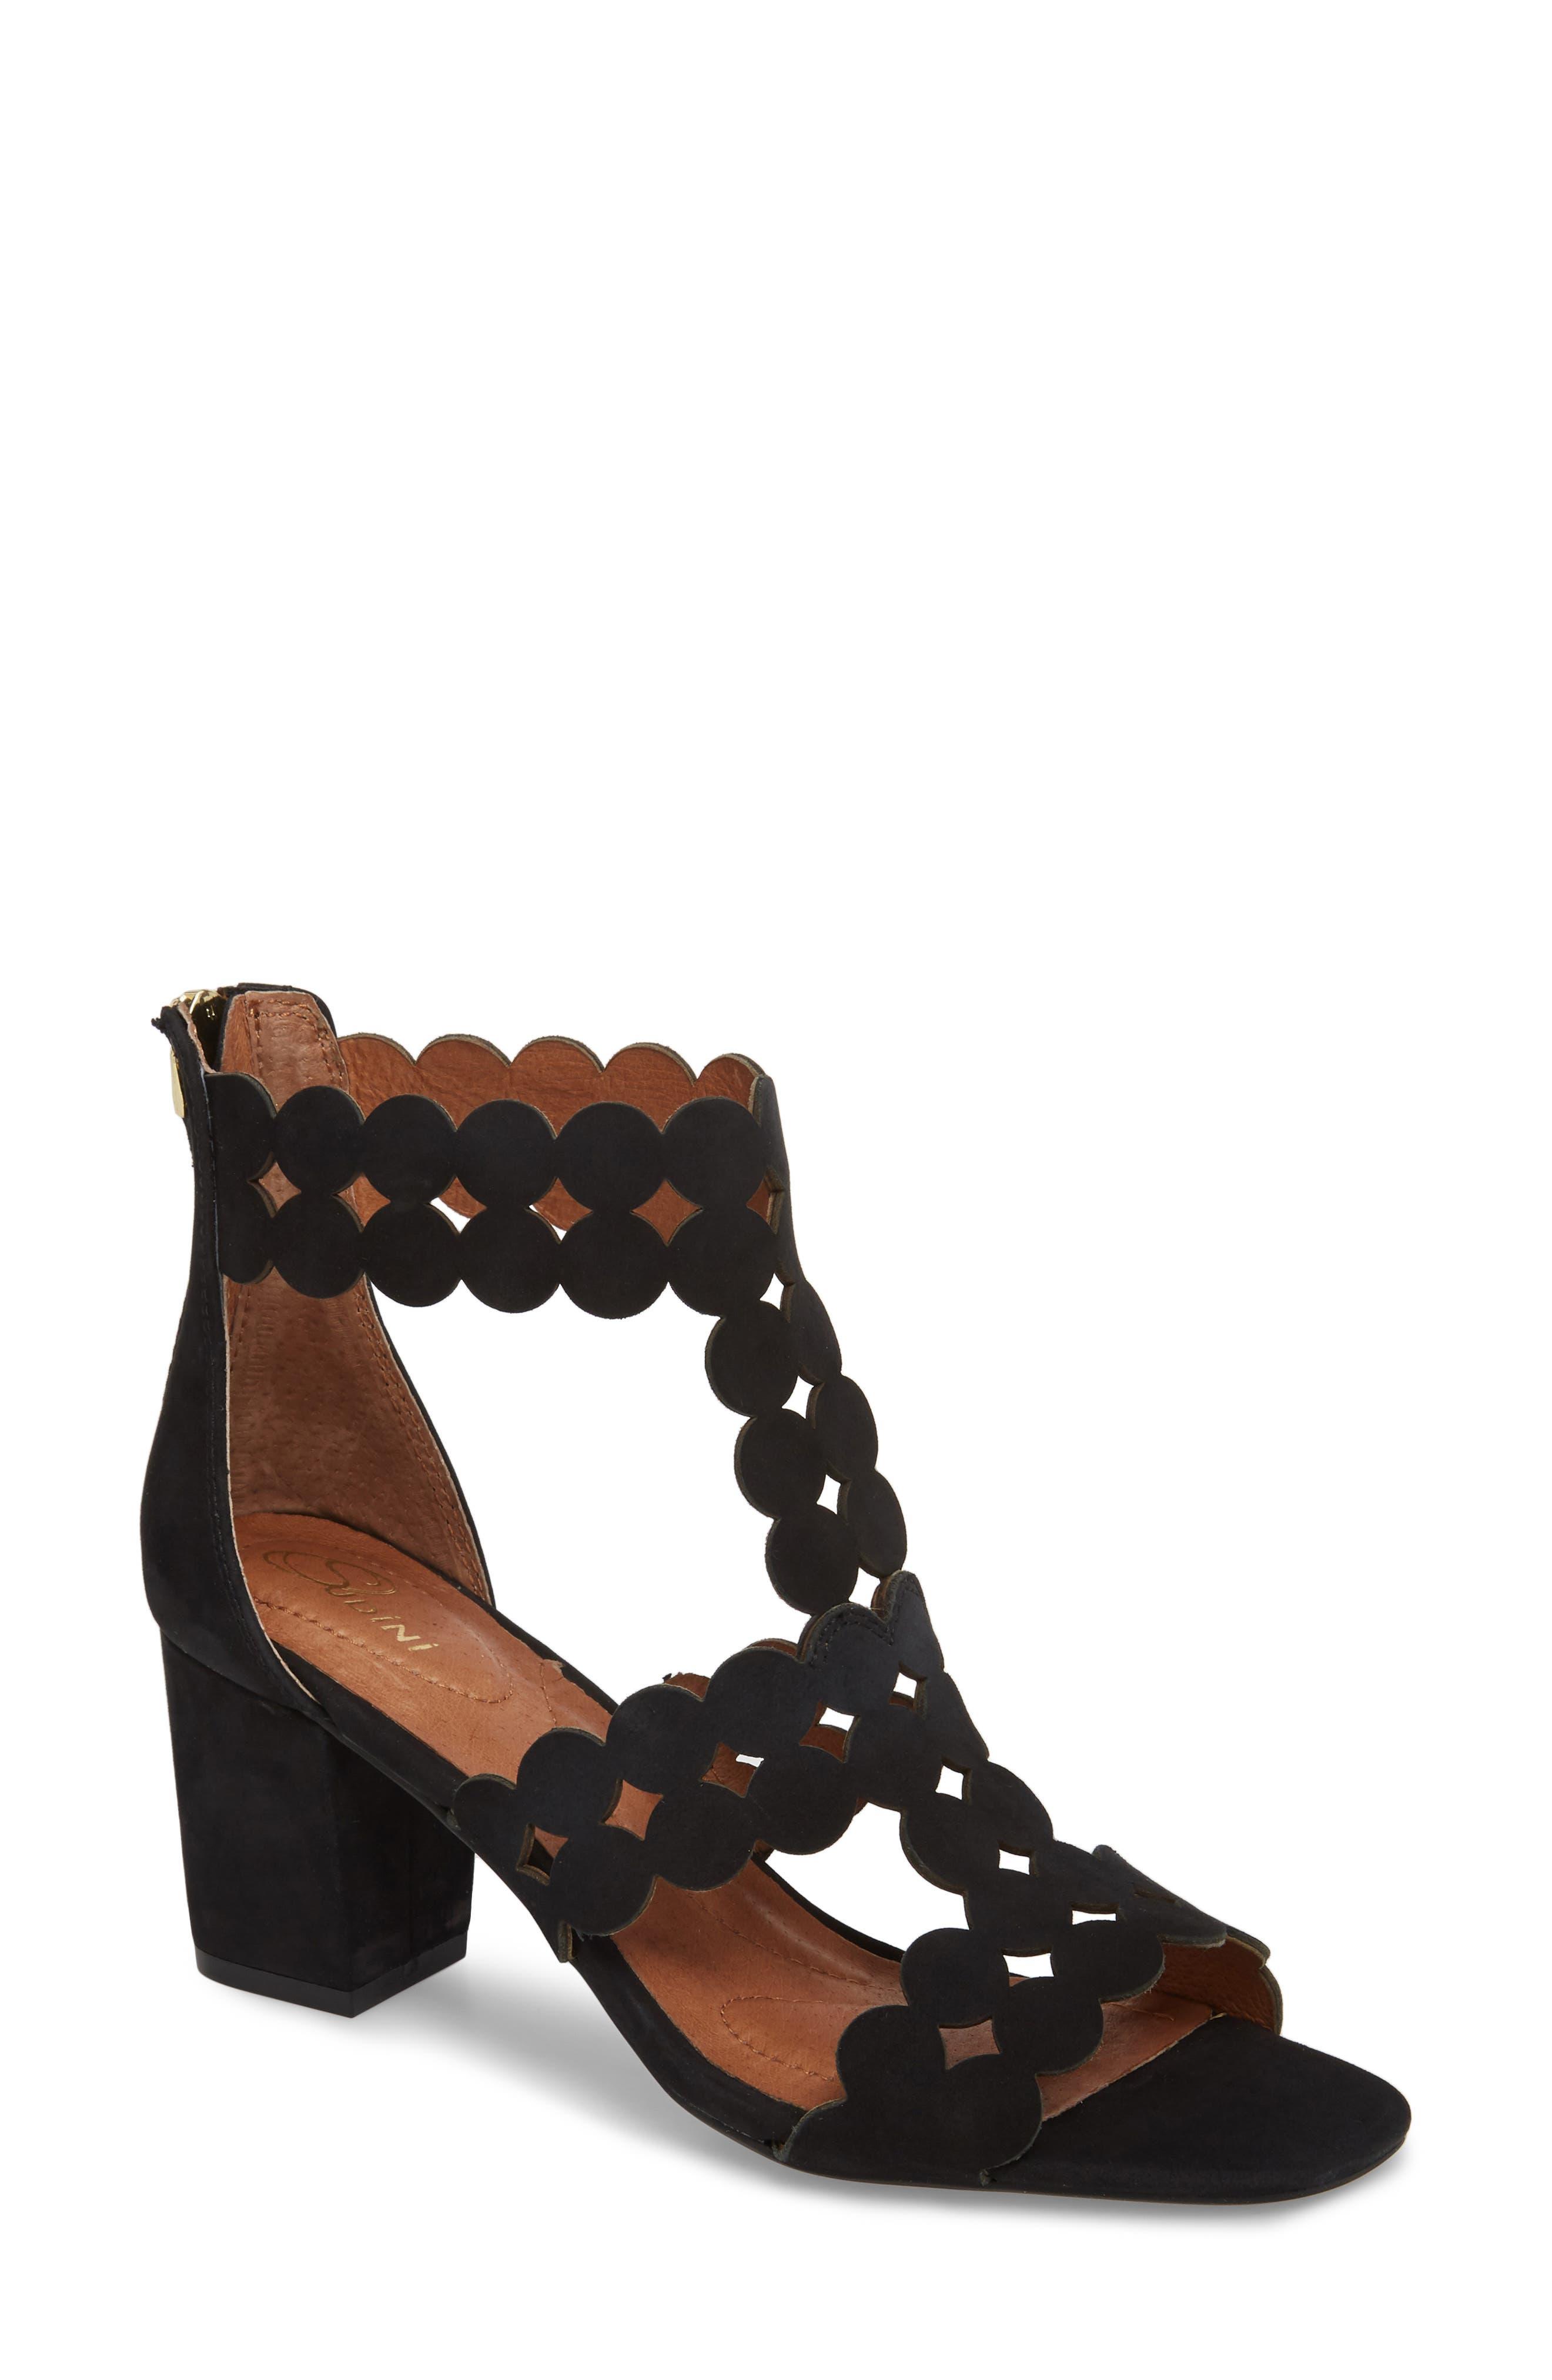 SUDINI Novara Block Heel Sandal, Main, color, BLACK NUBUCK LEATHER